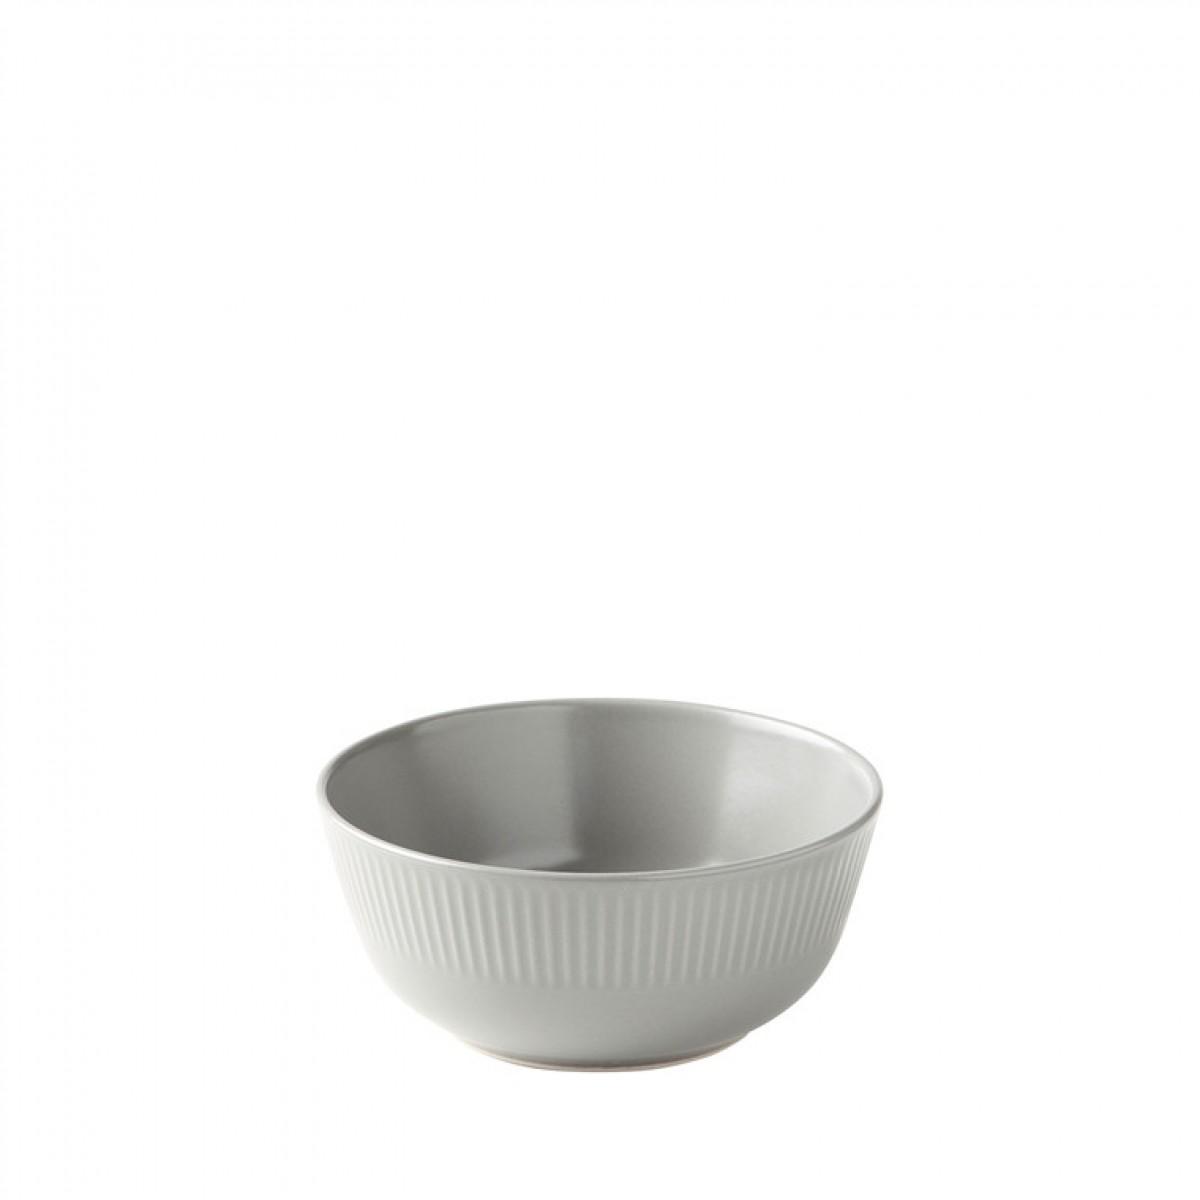 AIDA Groovy skål 14,5x6,5 cm grå